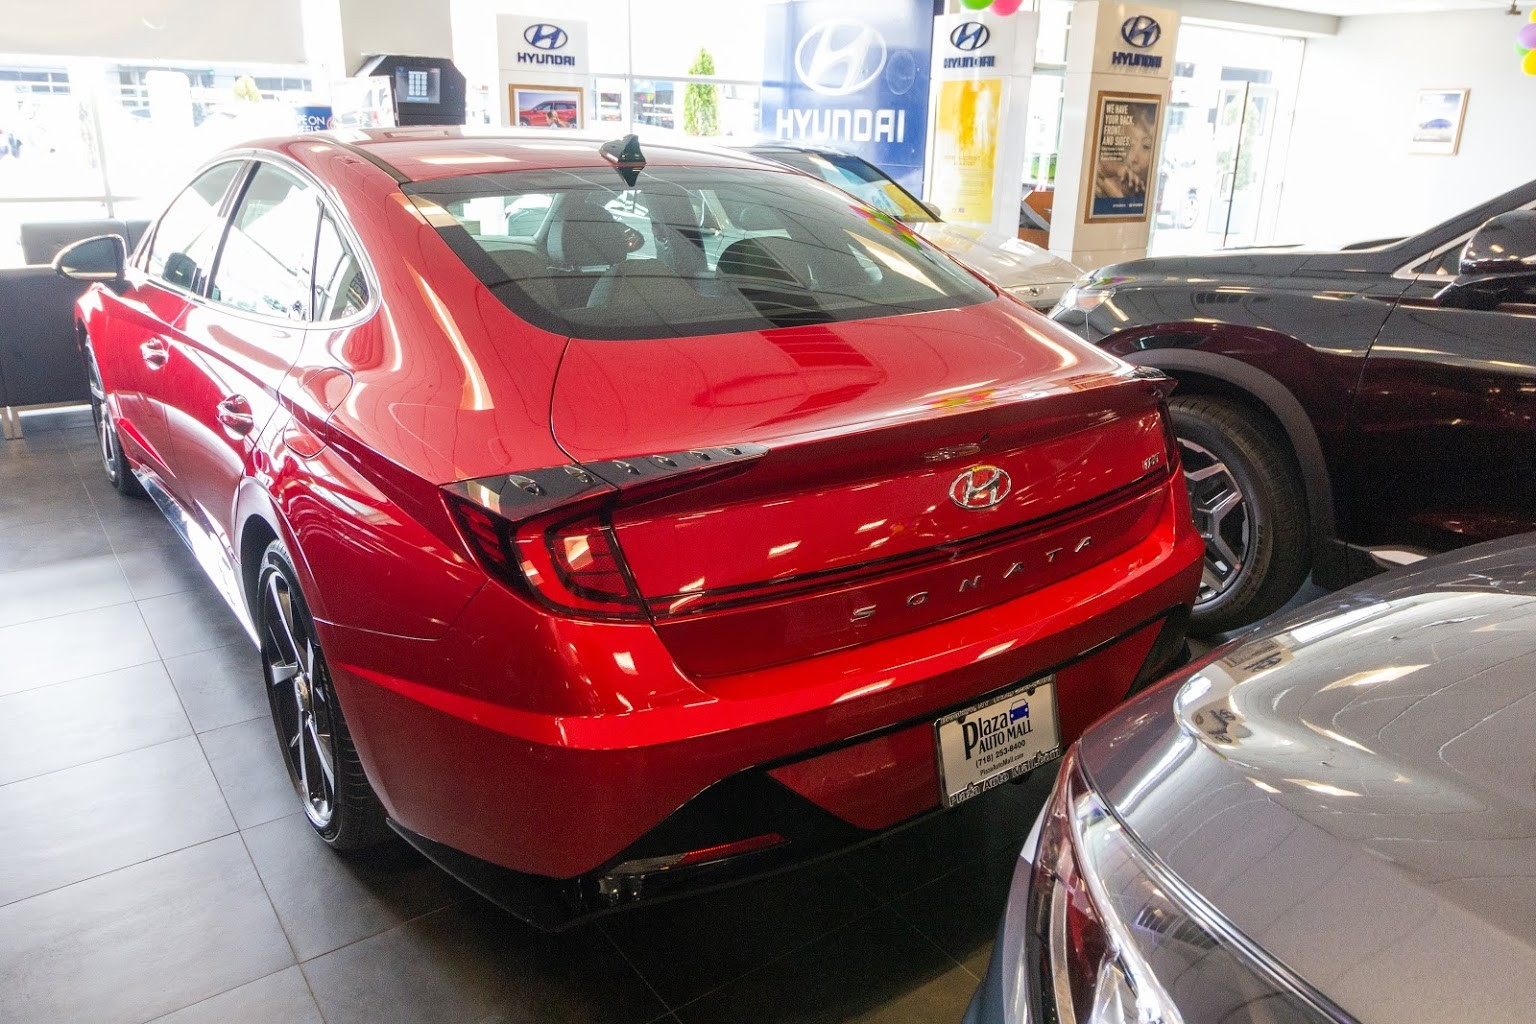 rear of red sonata Plaza Hyundai Car dealer in Brooklyn, NY